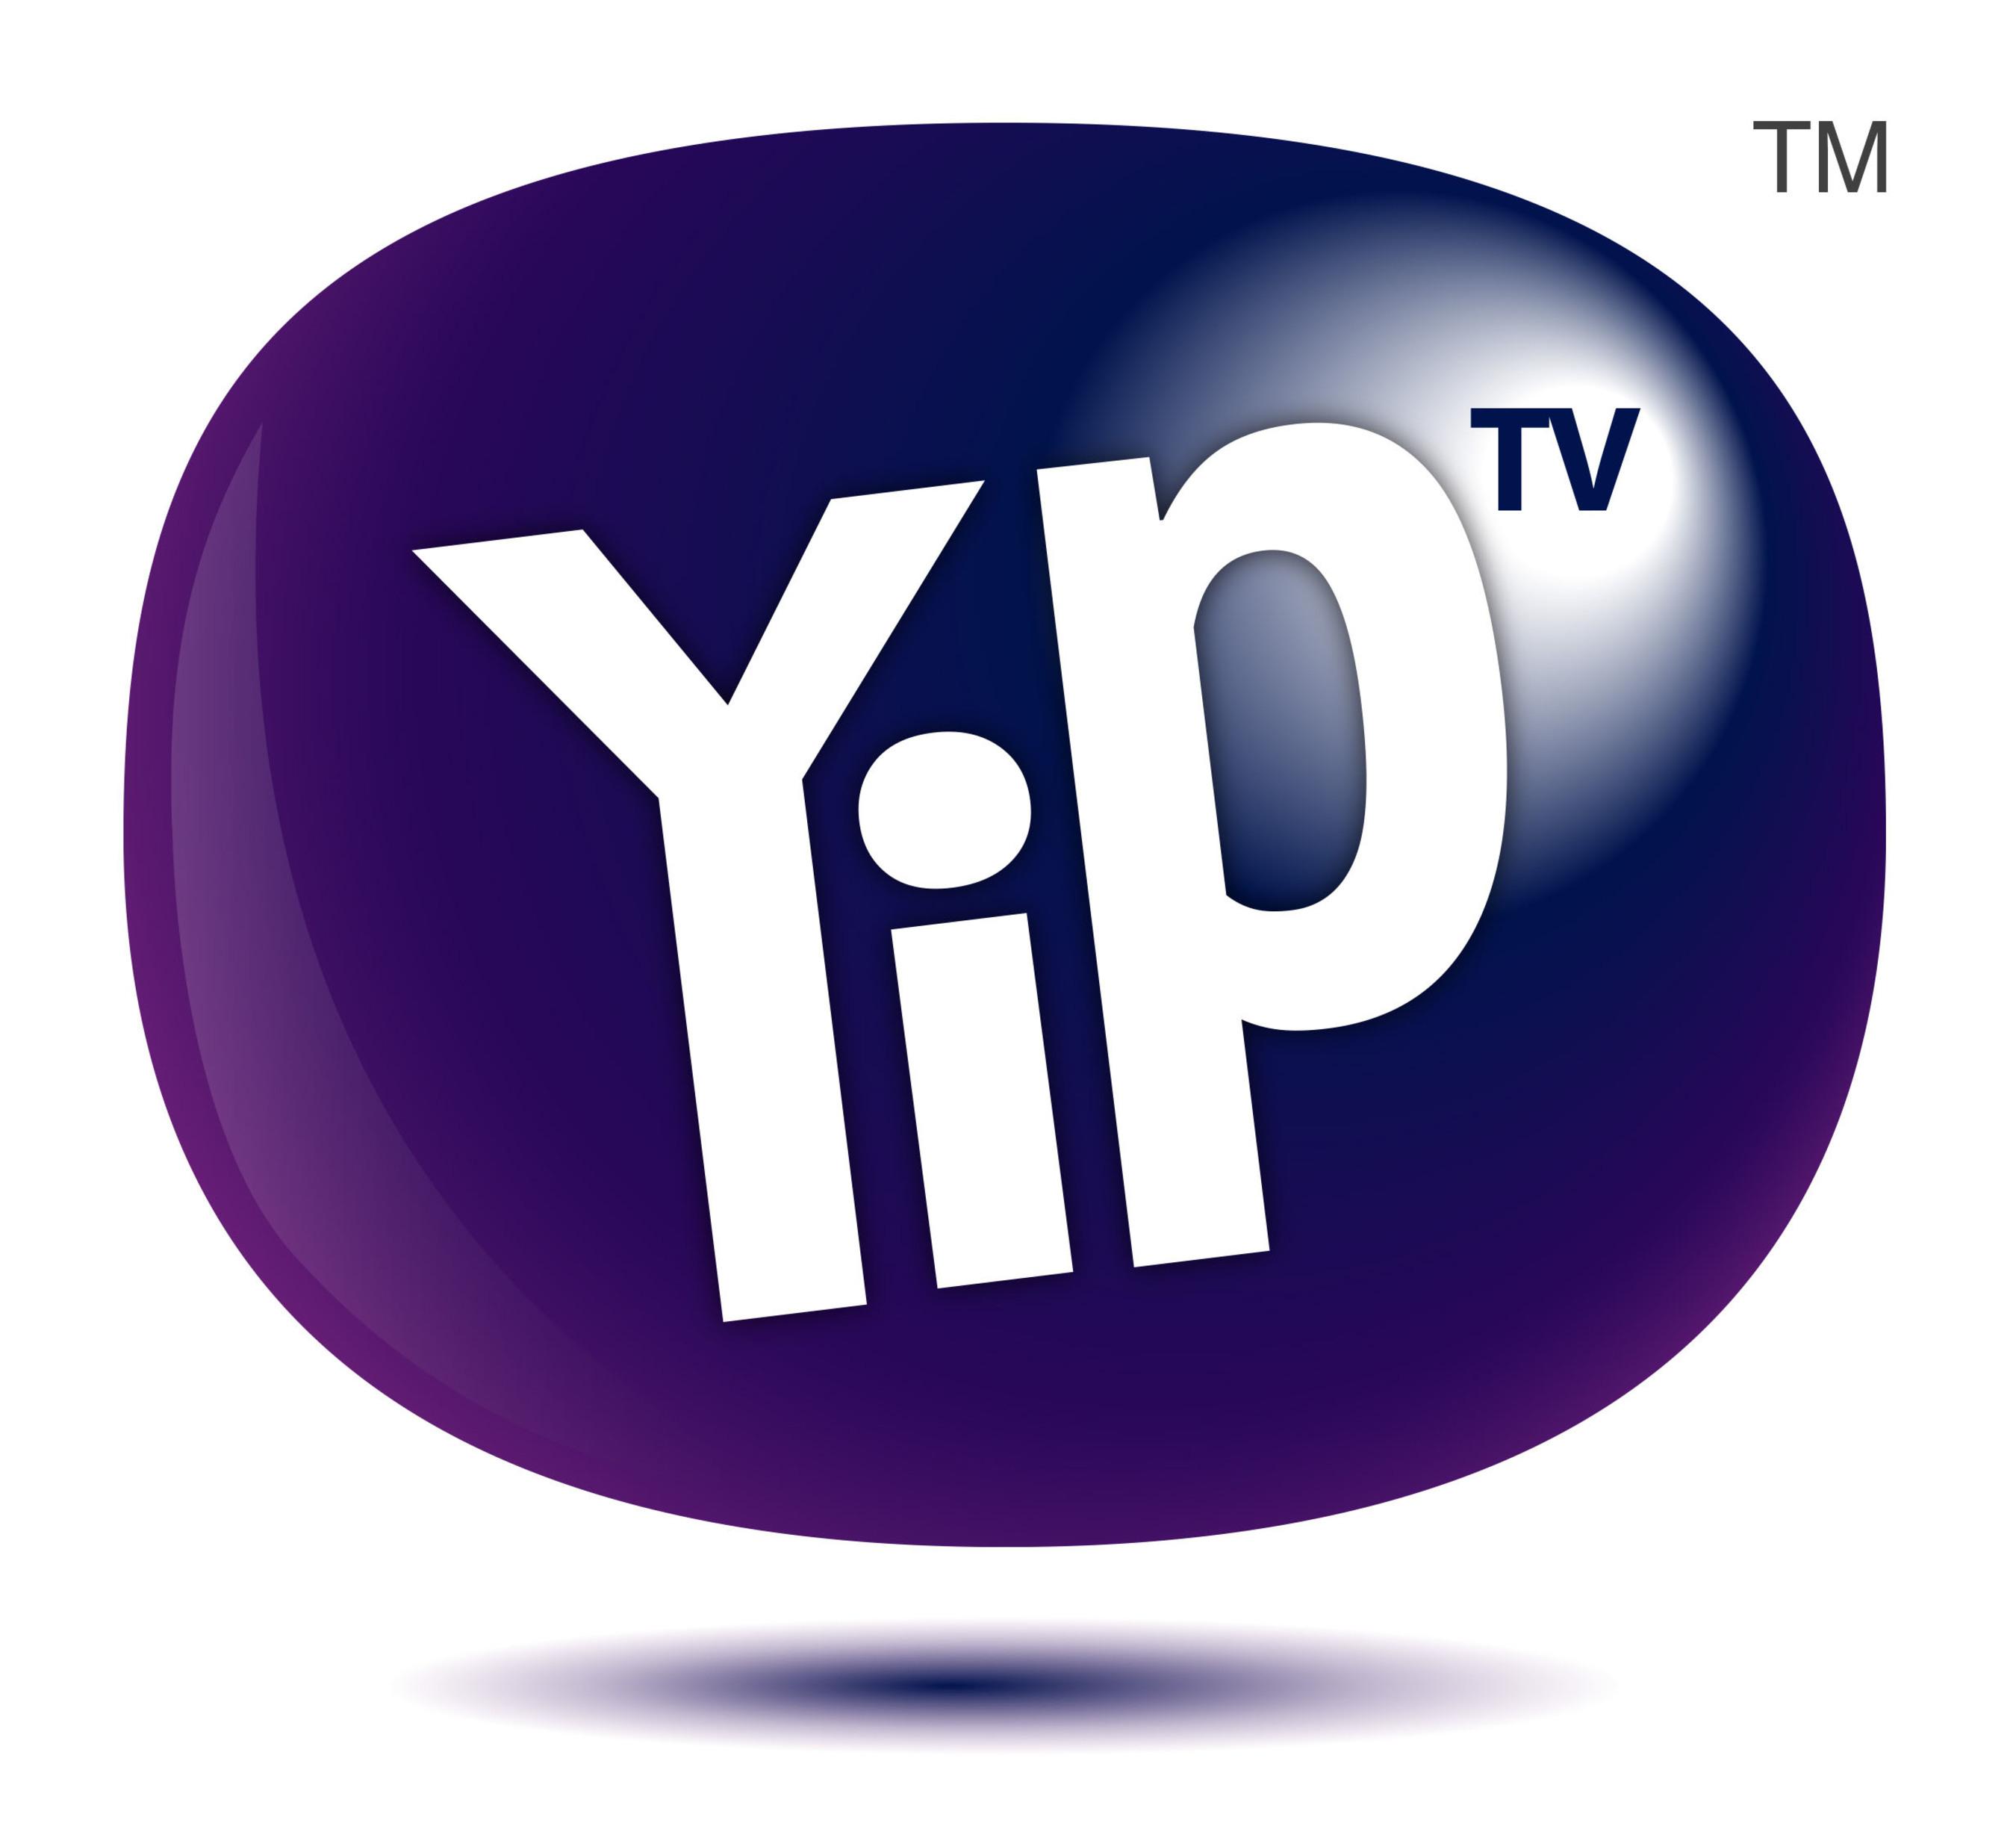 YipTV agrega ¡HOLA! TV a Su Red de Canales OTT